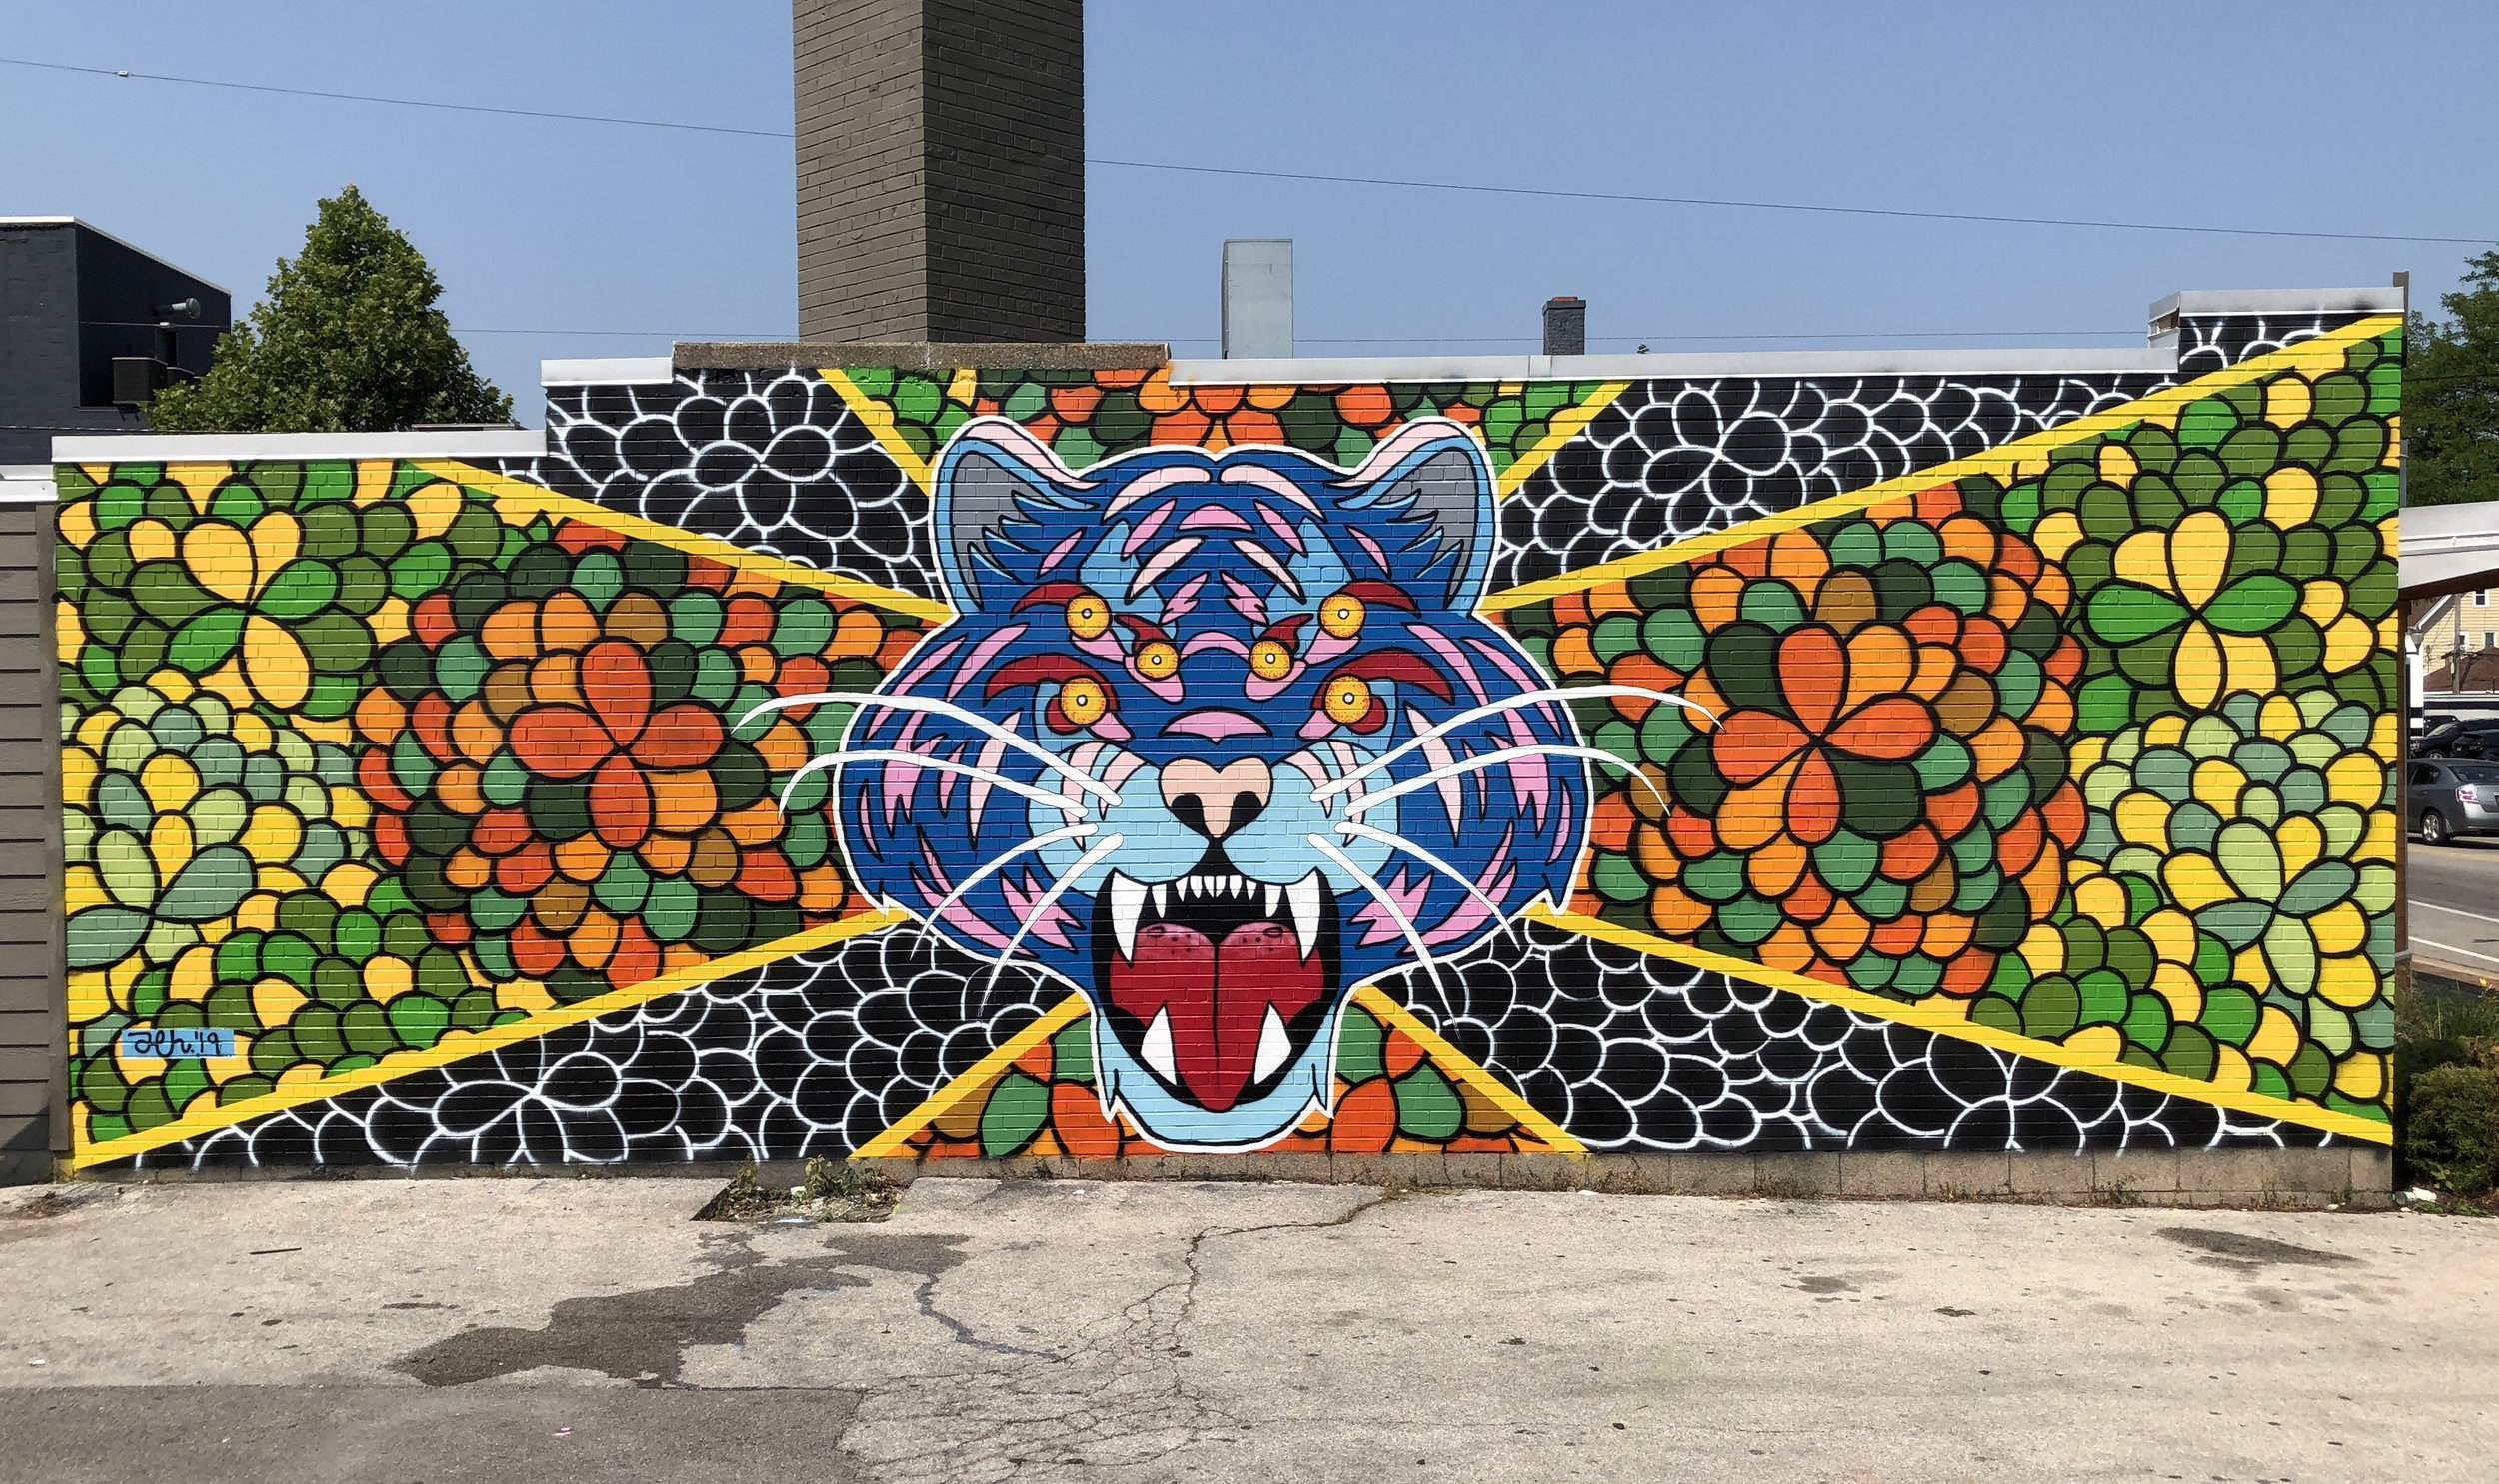 AHernandez_Wauwatosa Mural.jpg